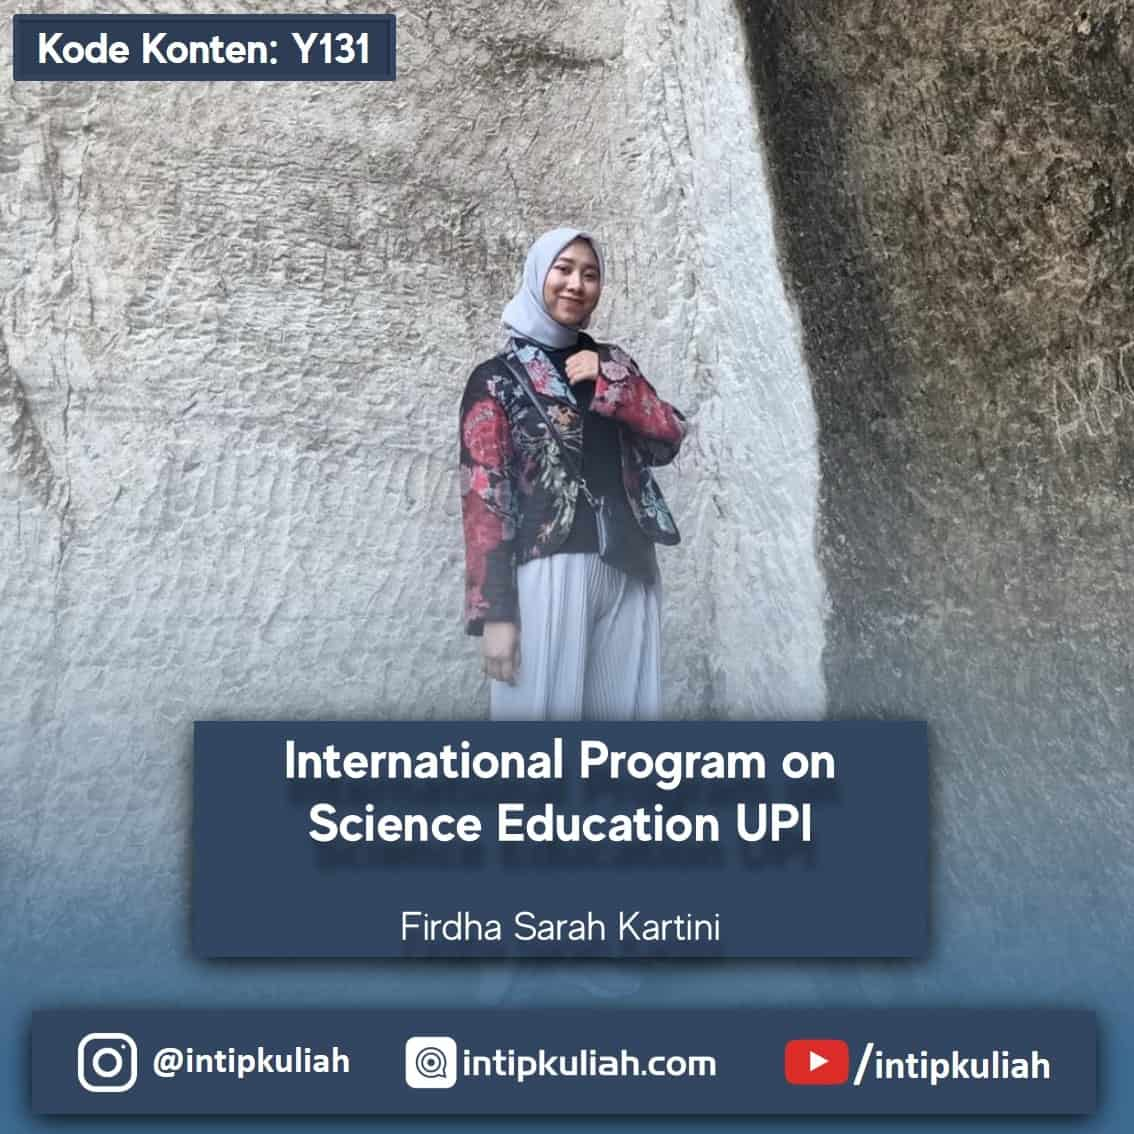 IPSE UPI / International Program on Science Education (Firdha)